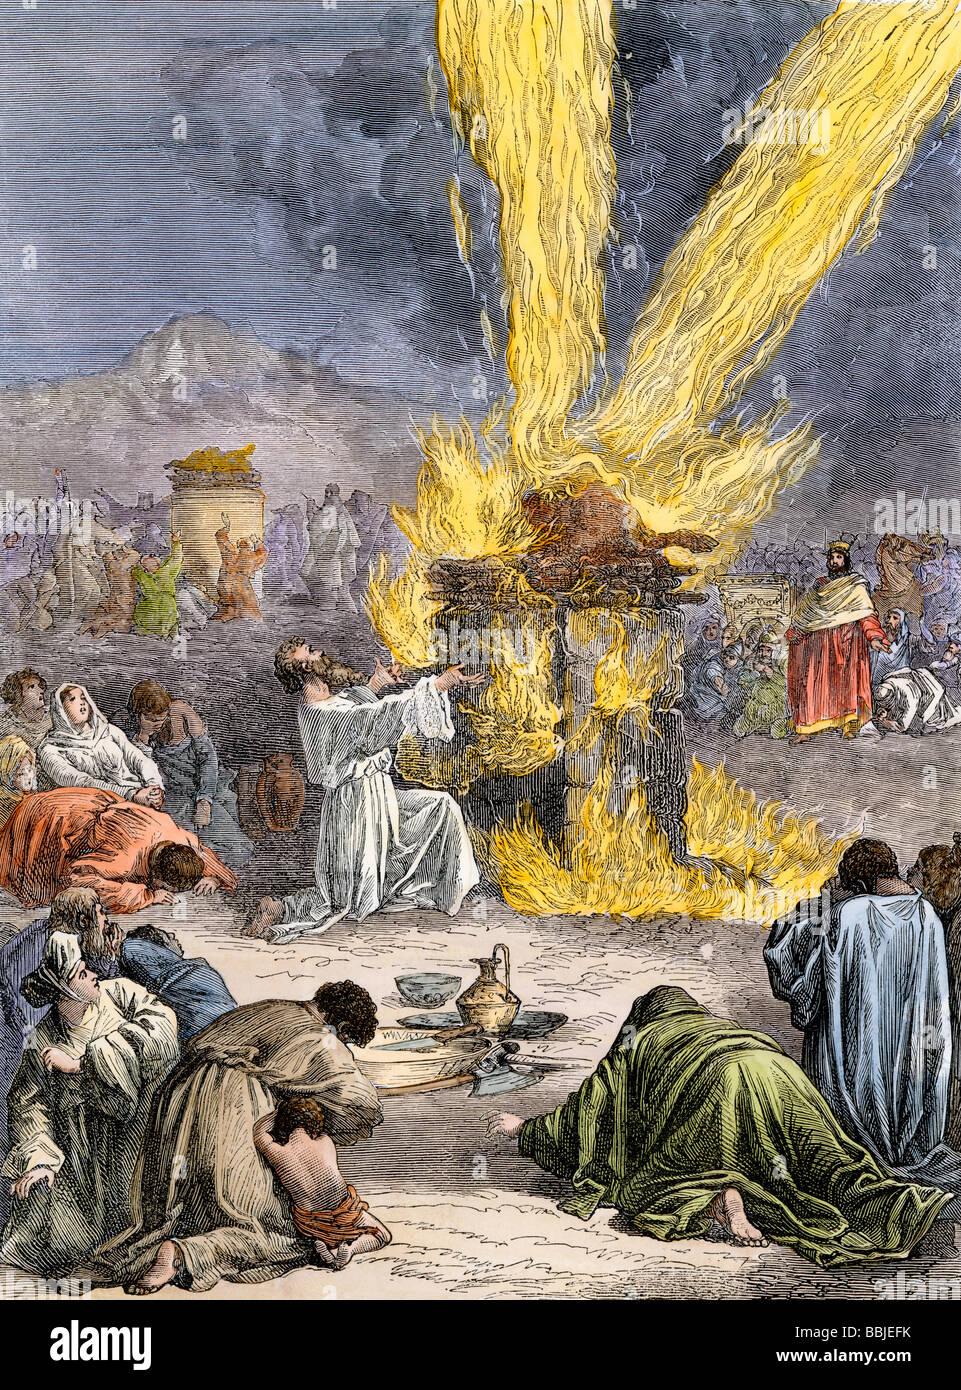 Prophet Elijah invoking Yahweh over Baals priests on Mount Carmel. Hand-colored woodcut - Stock Image